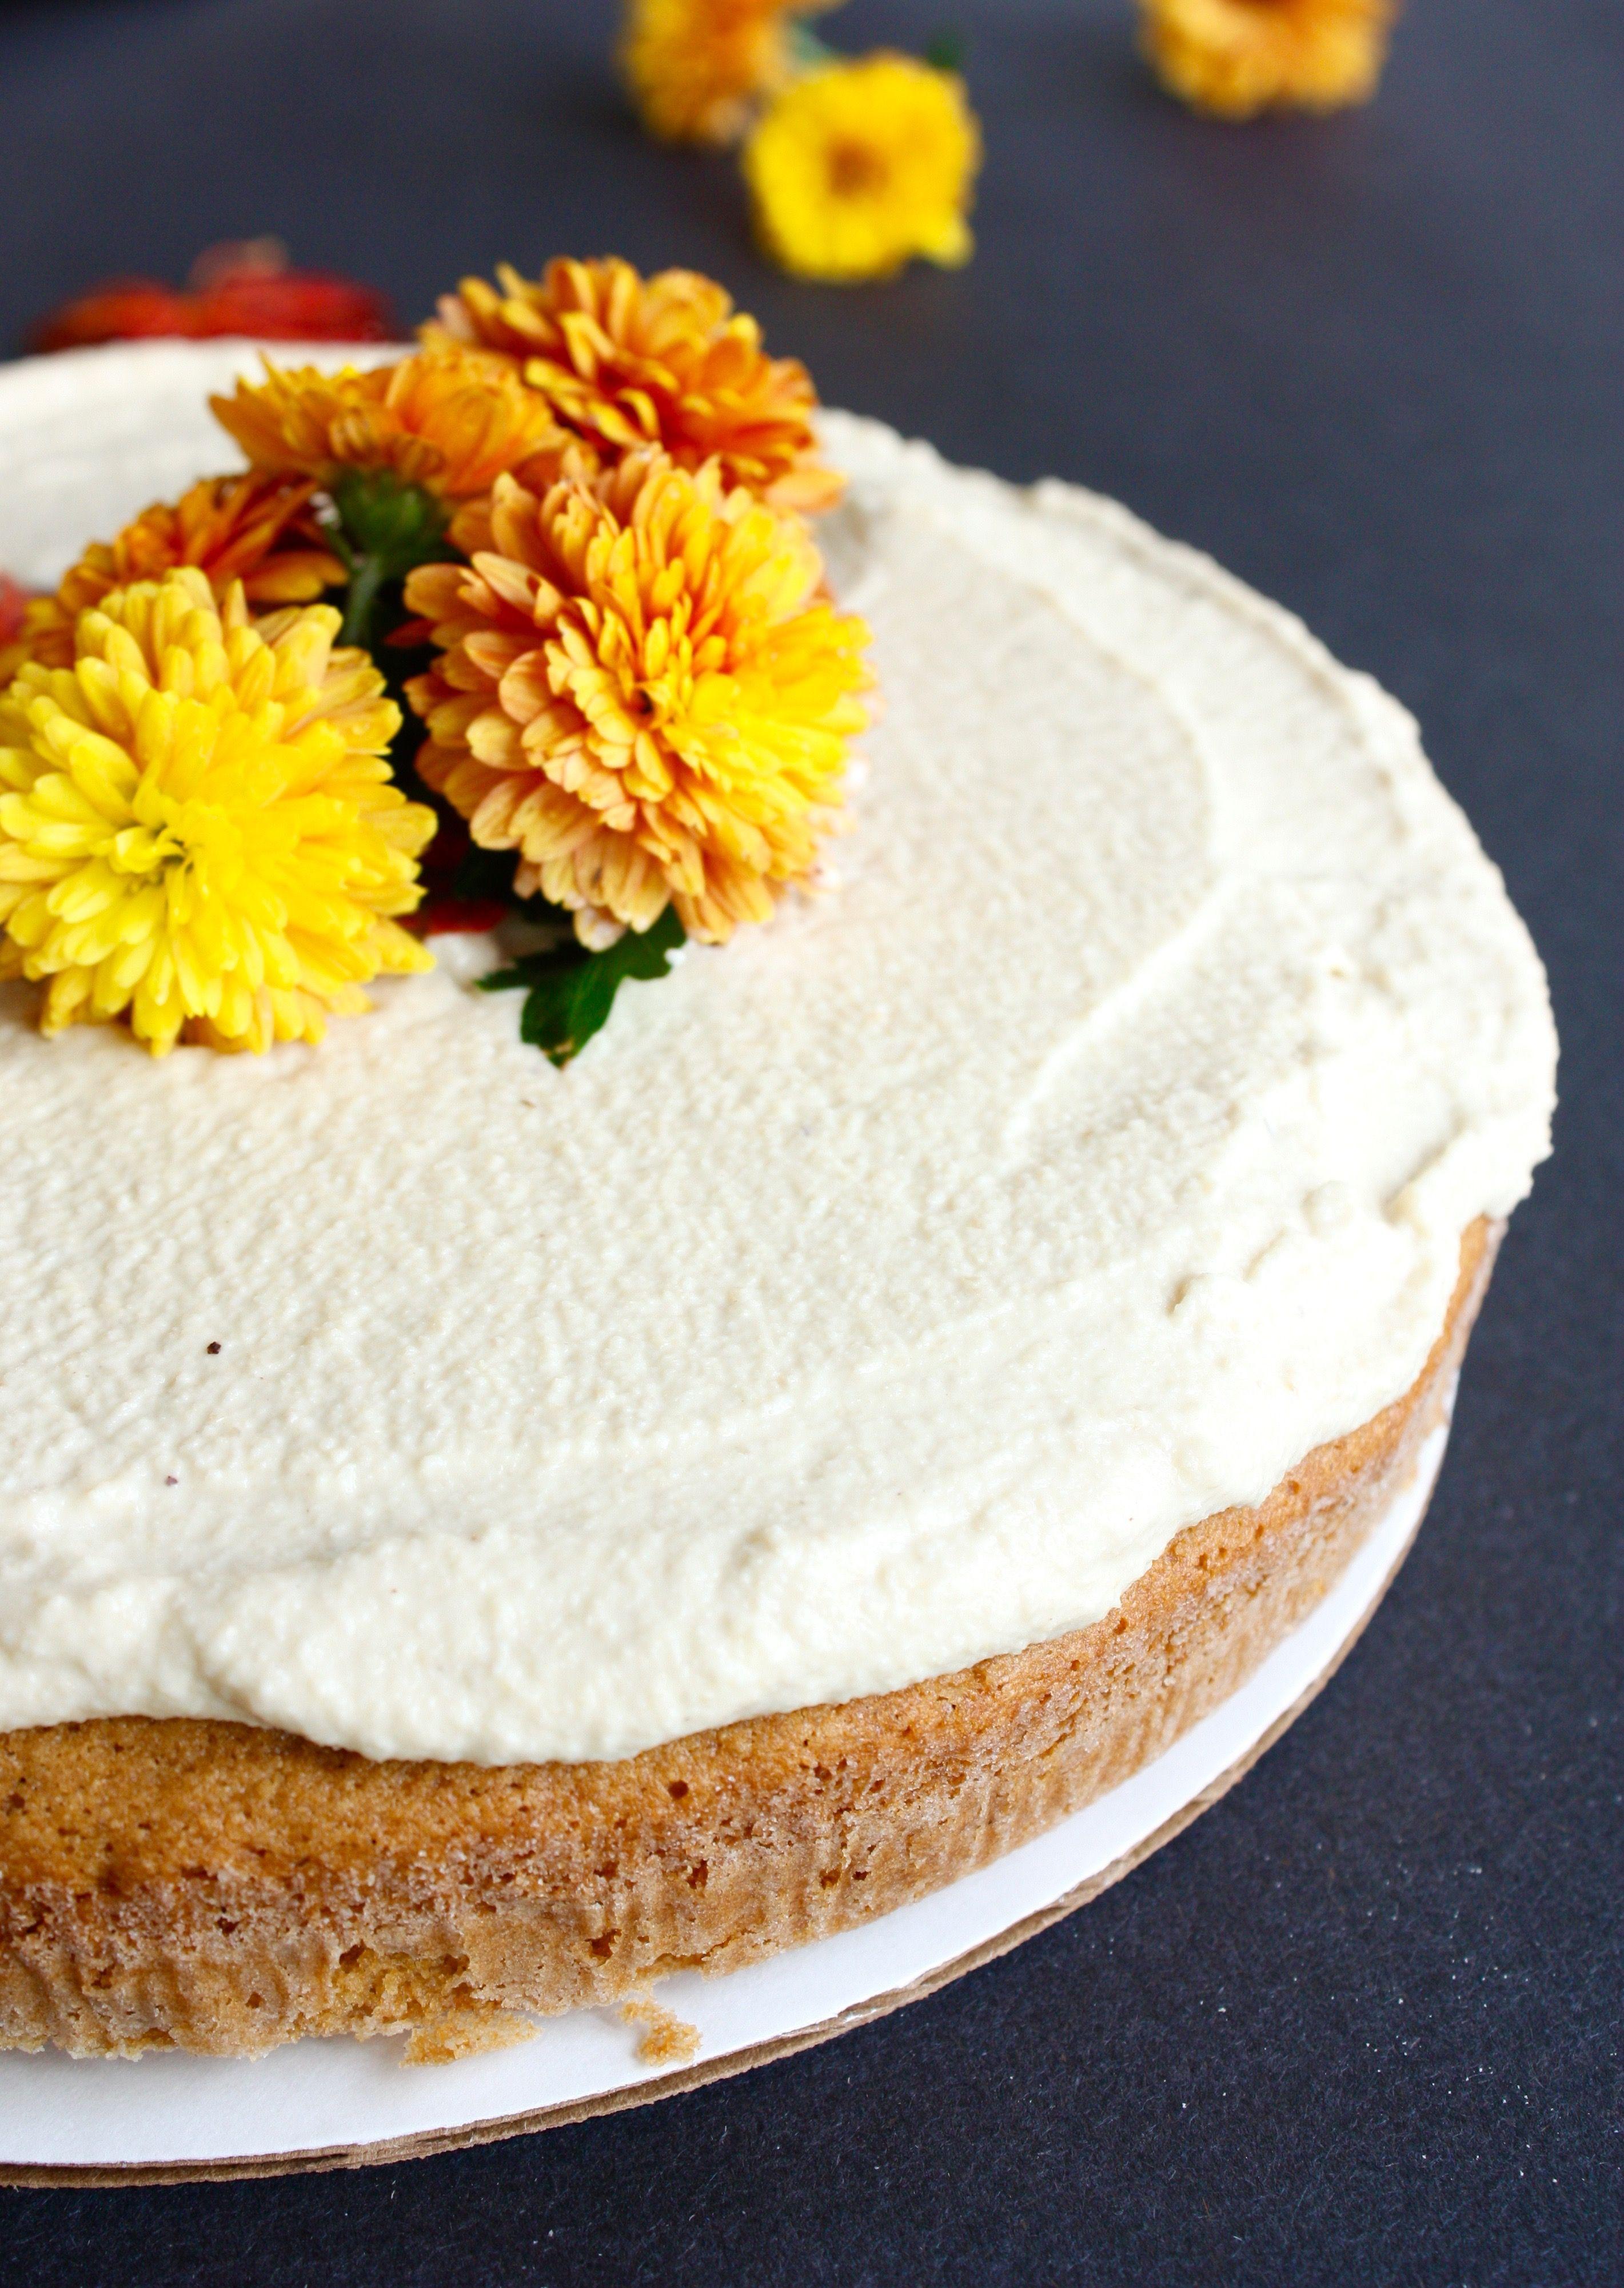 Glutenfree cake recipe gluten free cake eat gluten